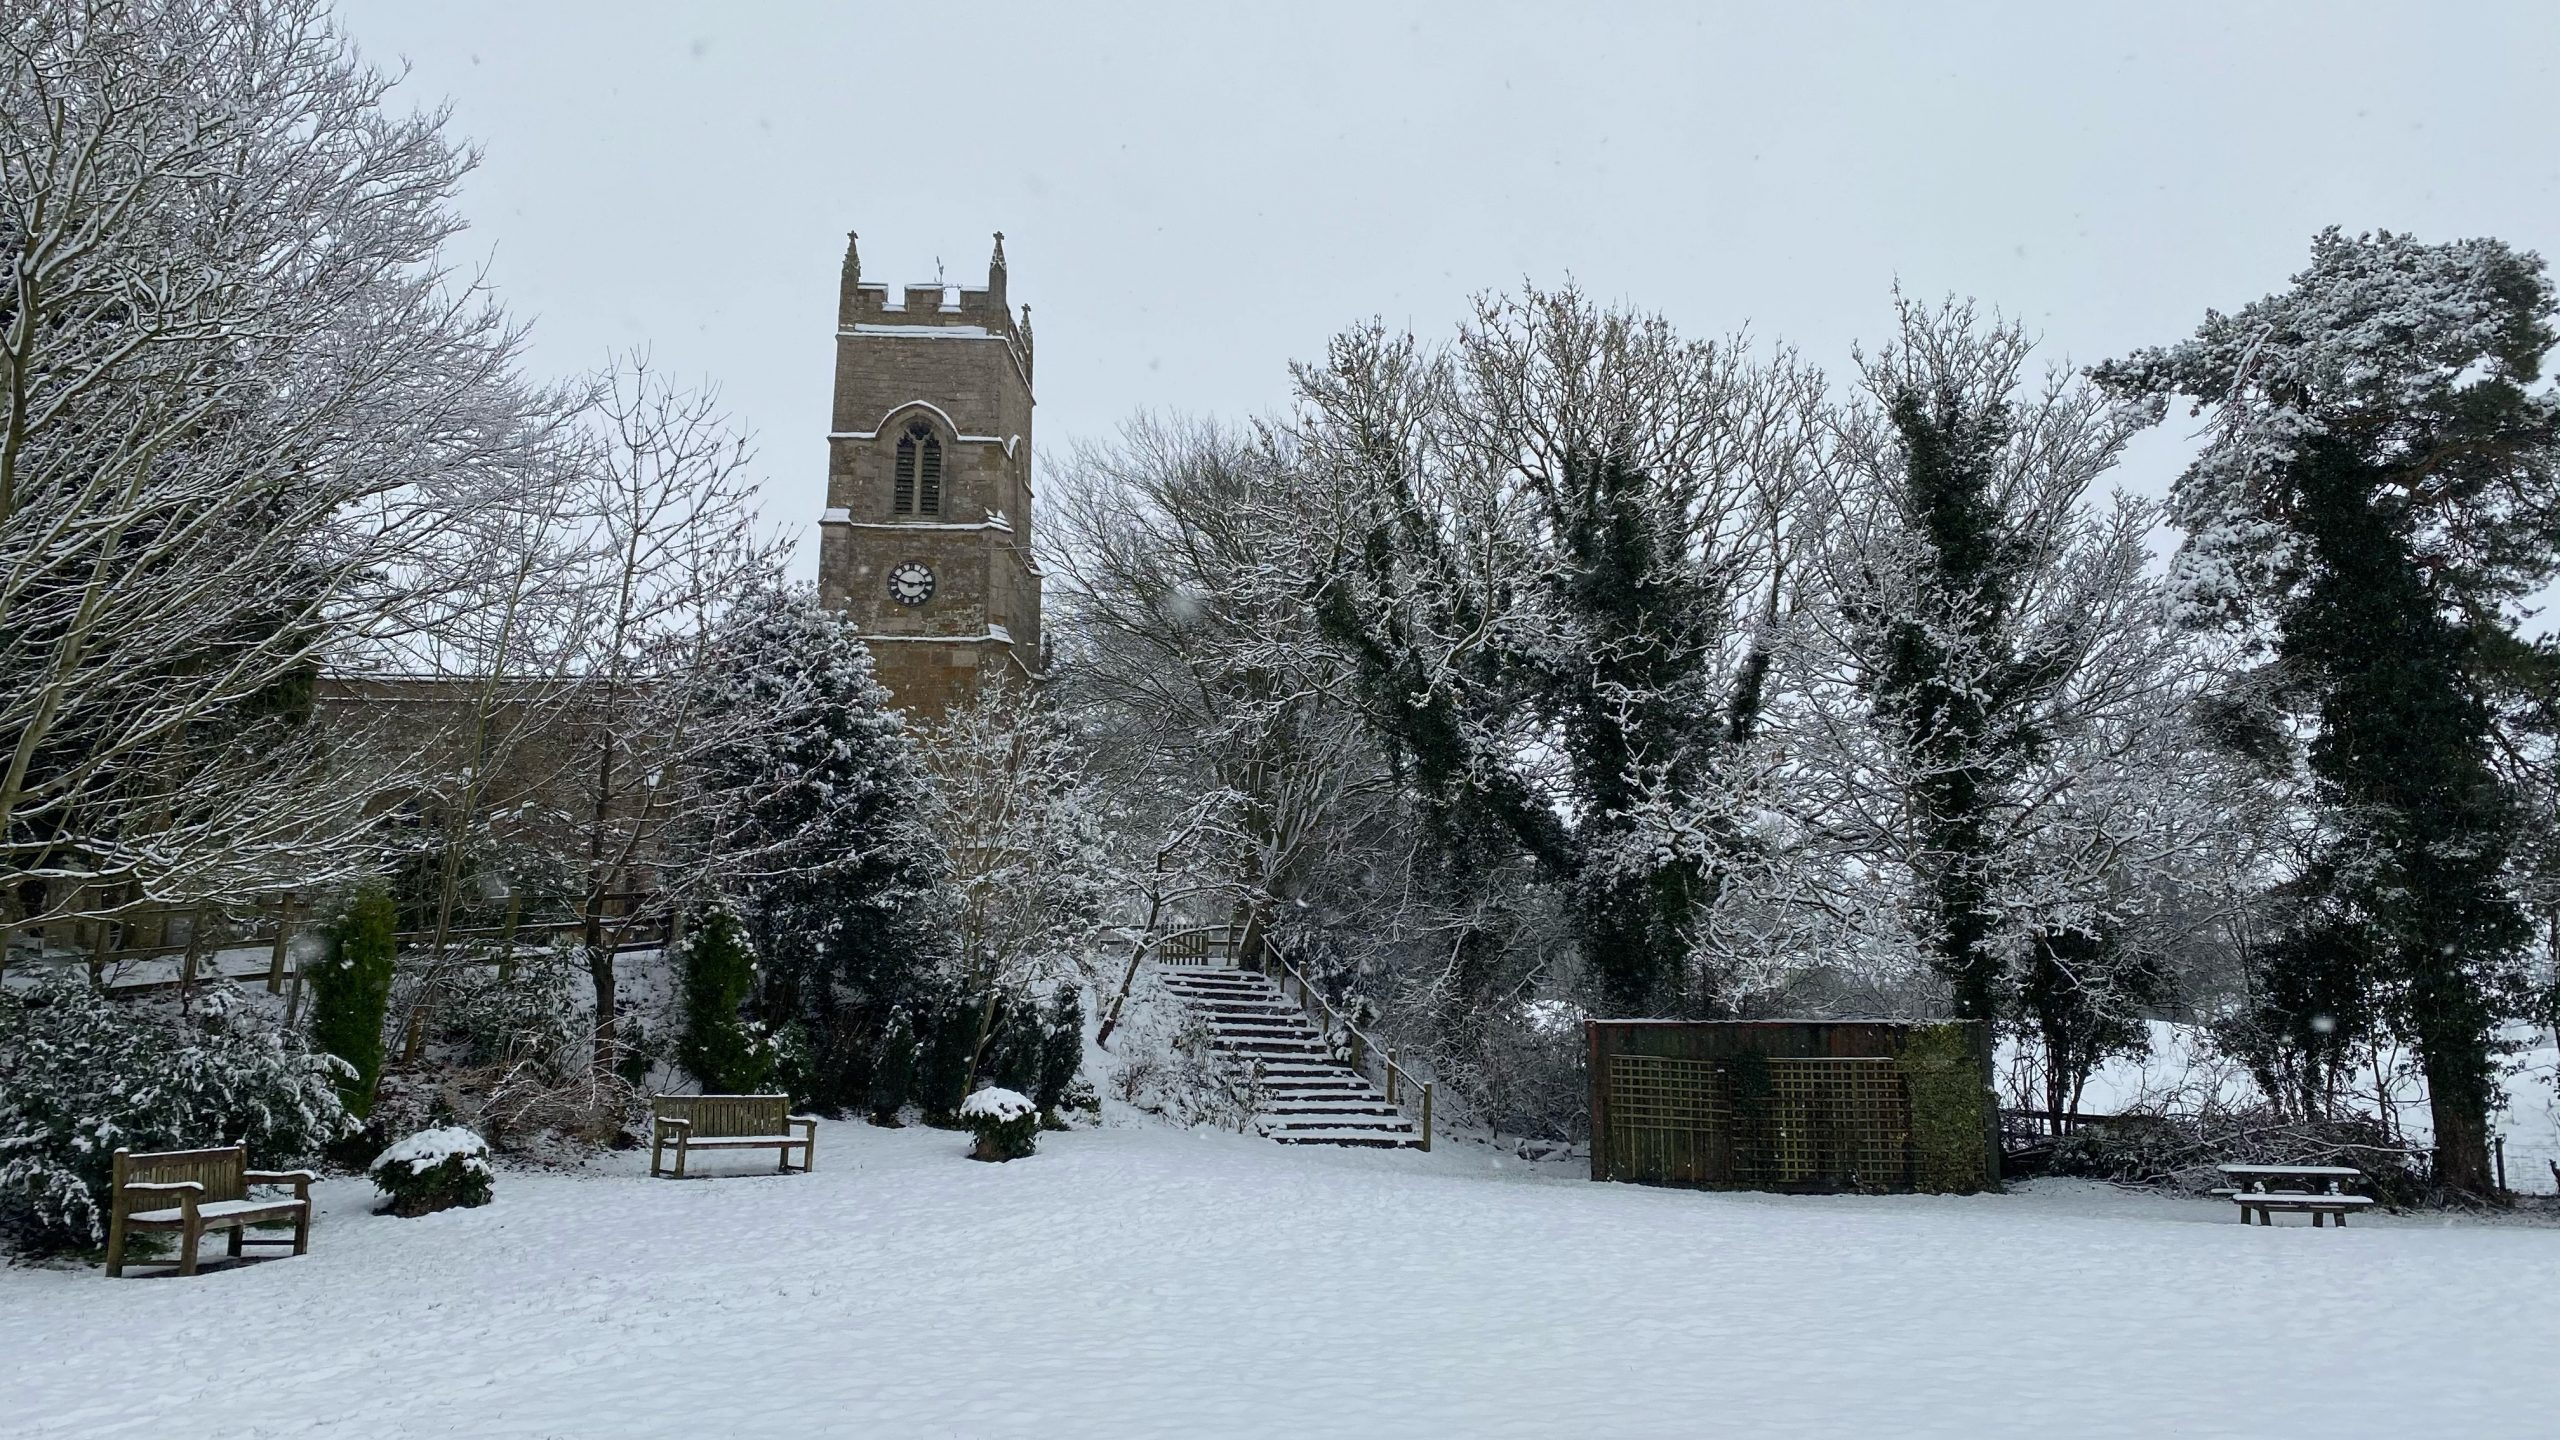 Marriott Green & Church in the Snow